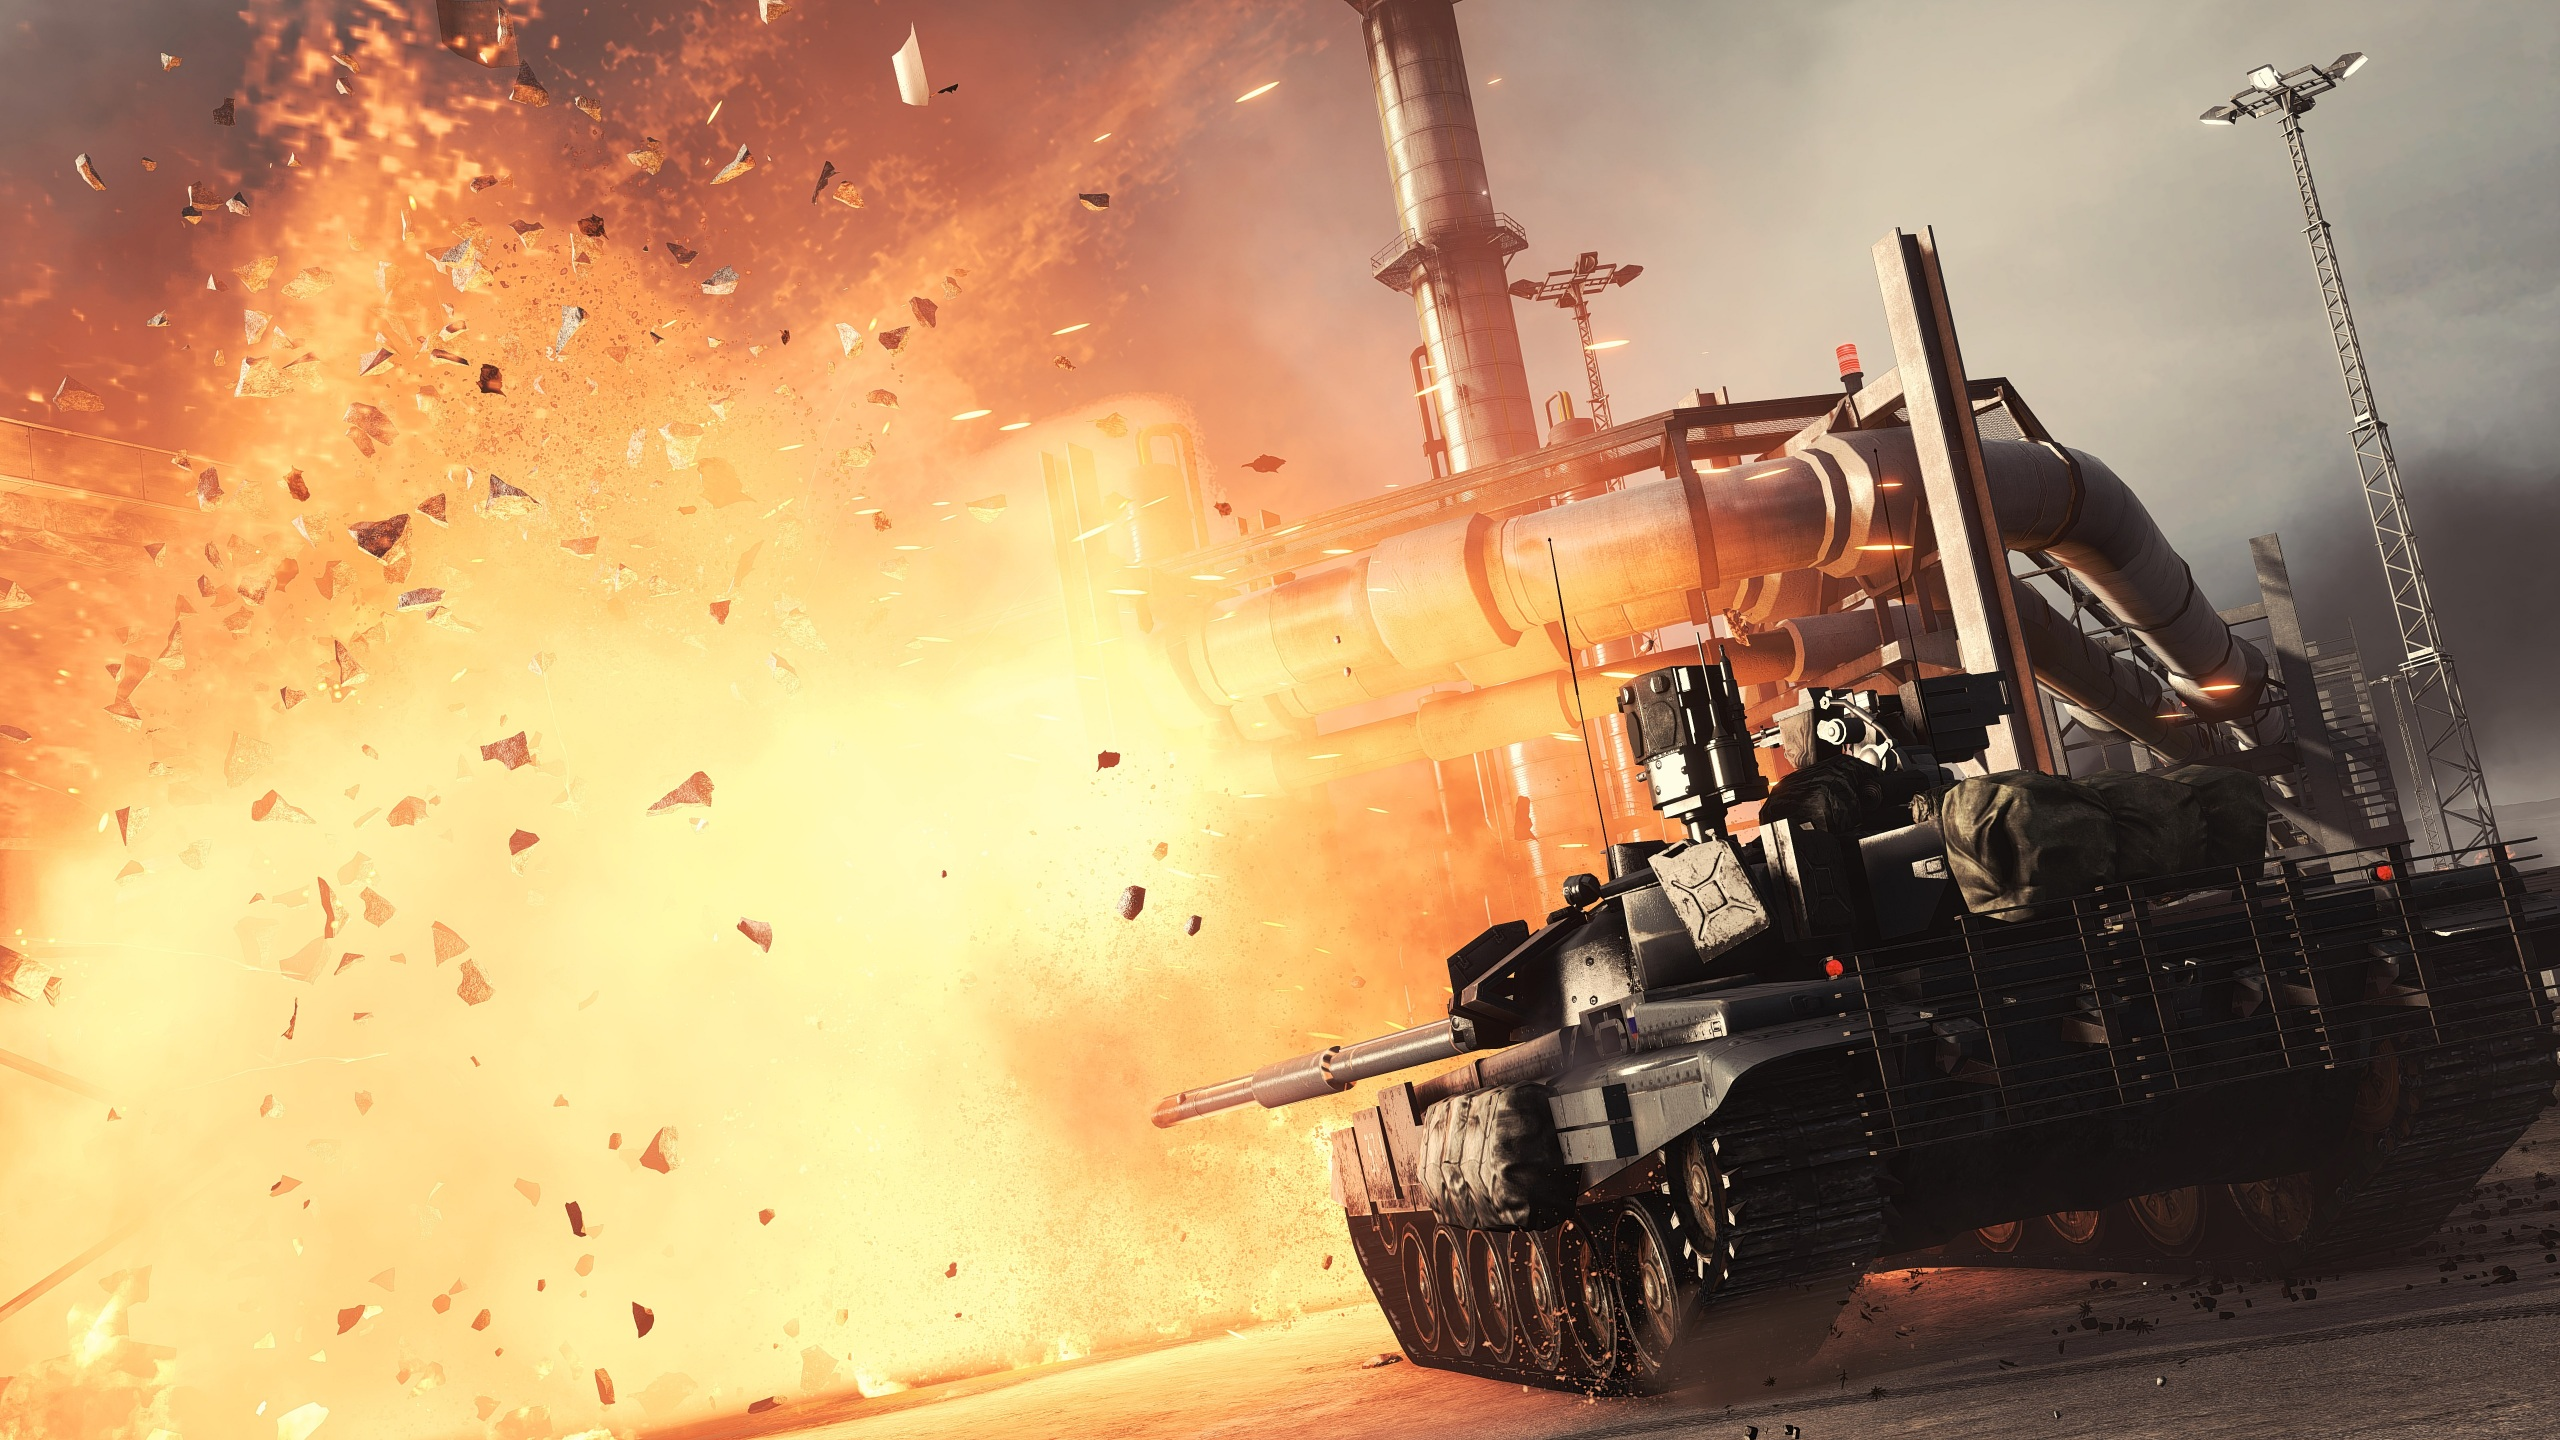 Wallpaper Battlefield 4 Tanks Explosions Russian 3d 2560x1440